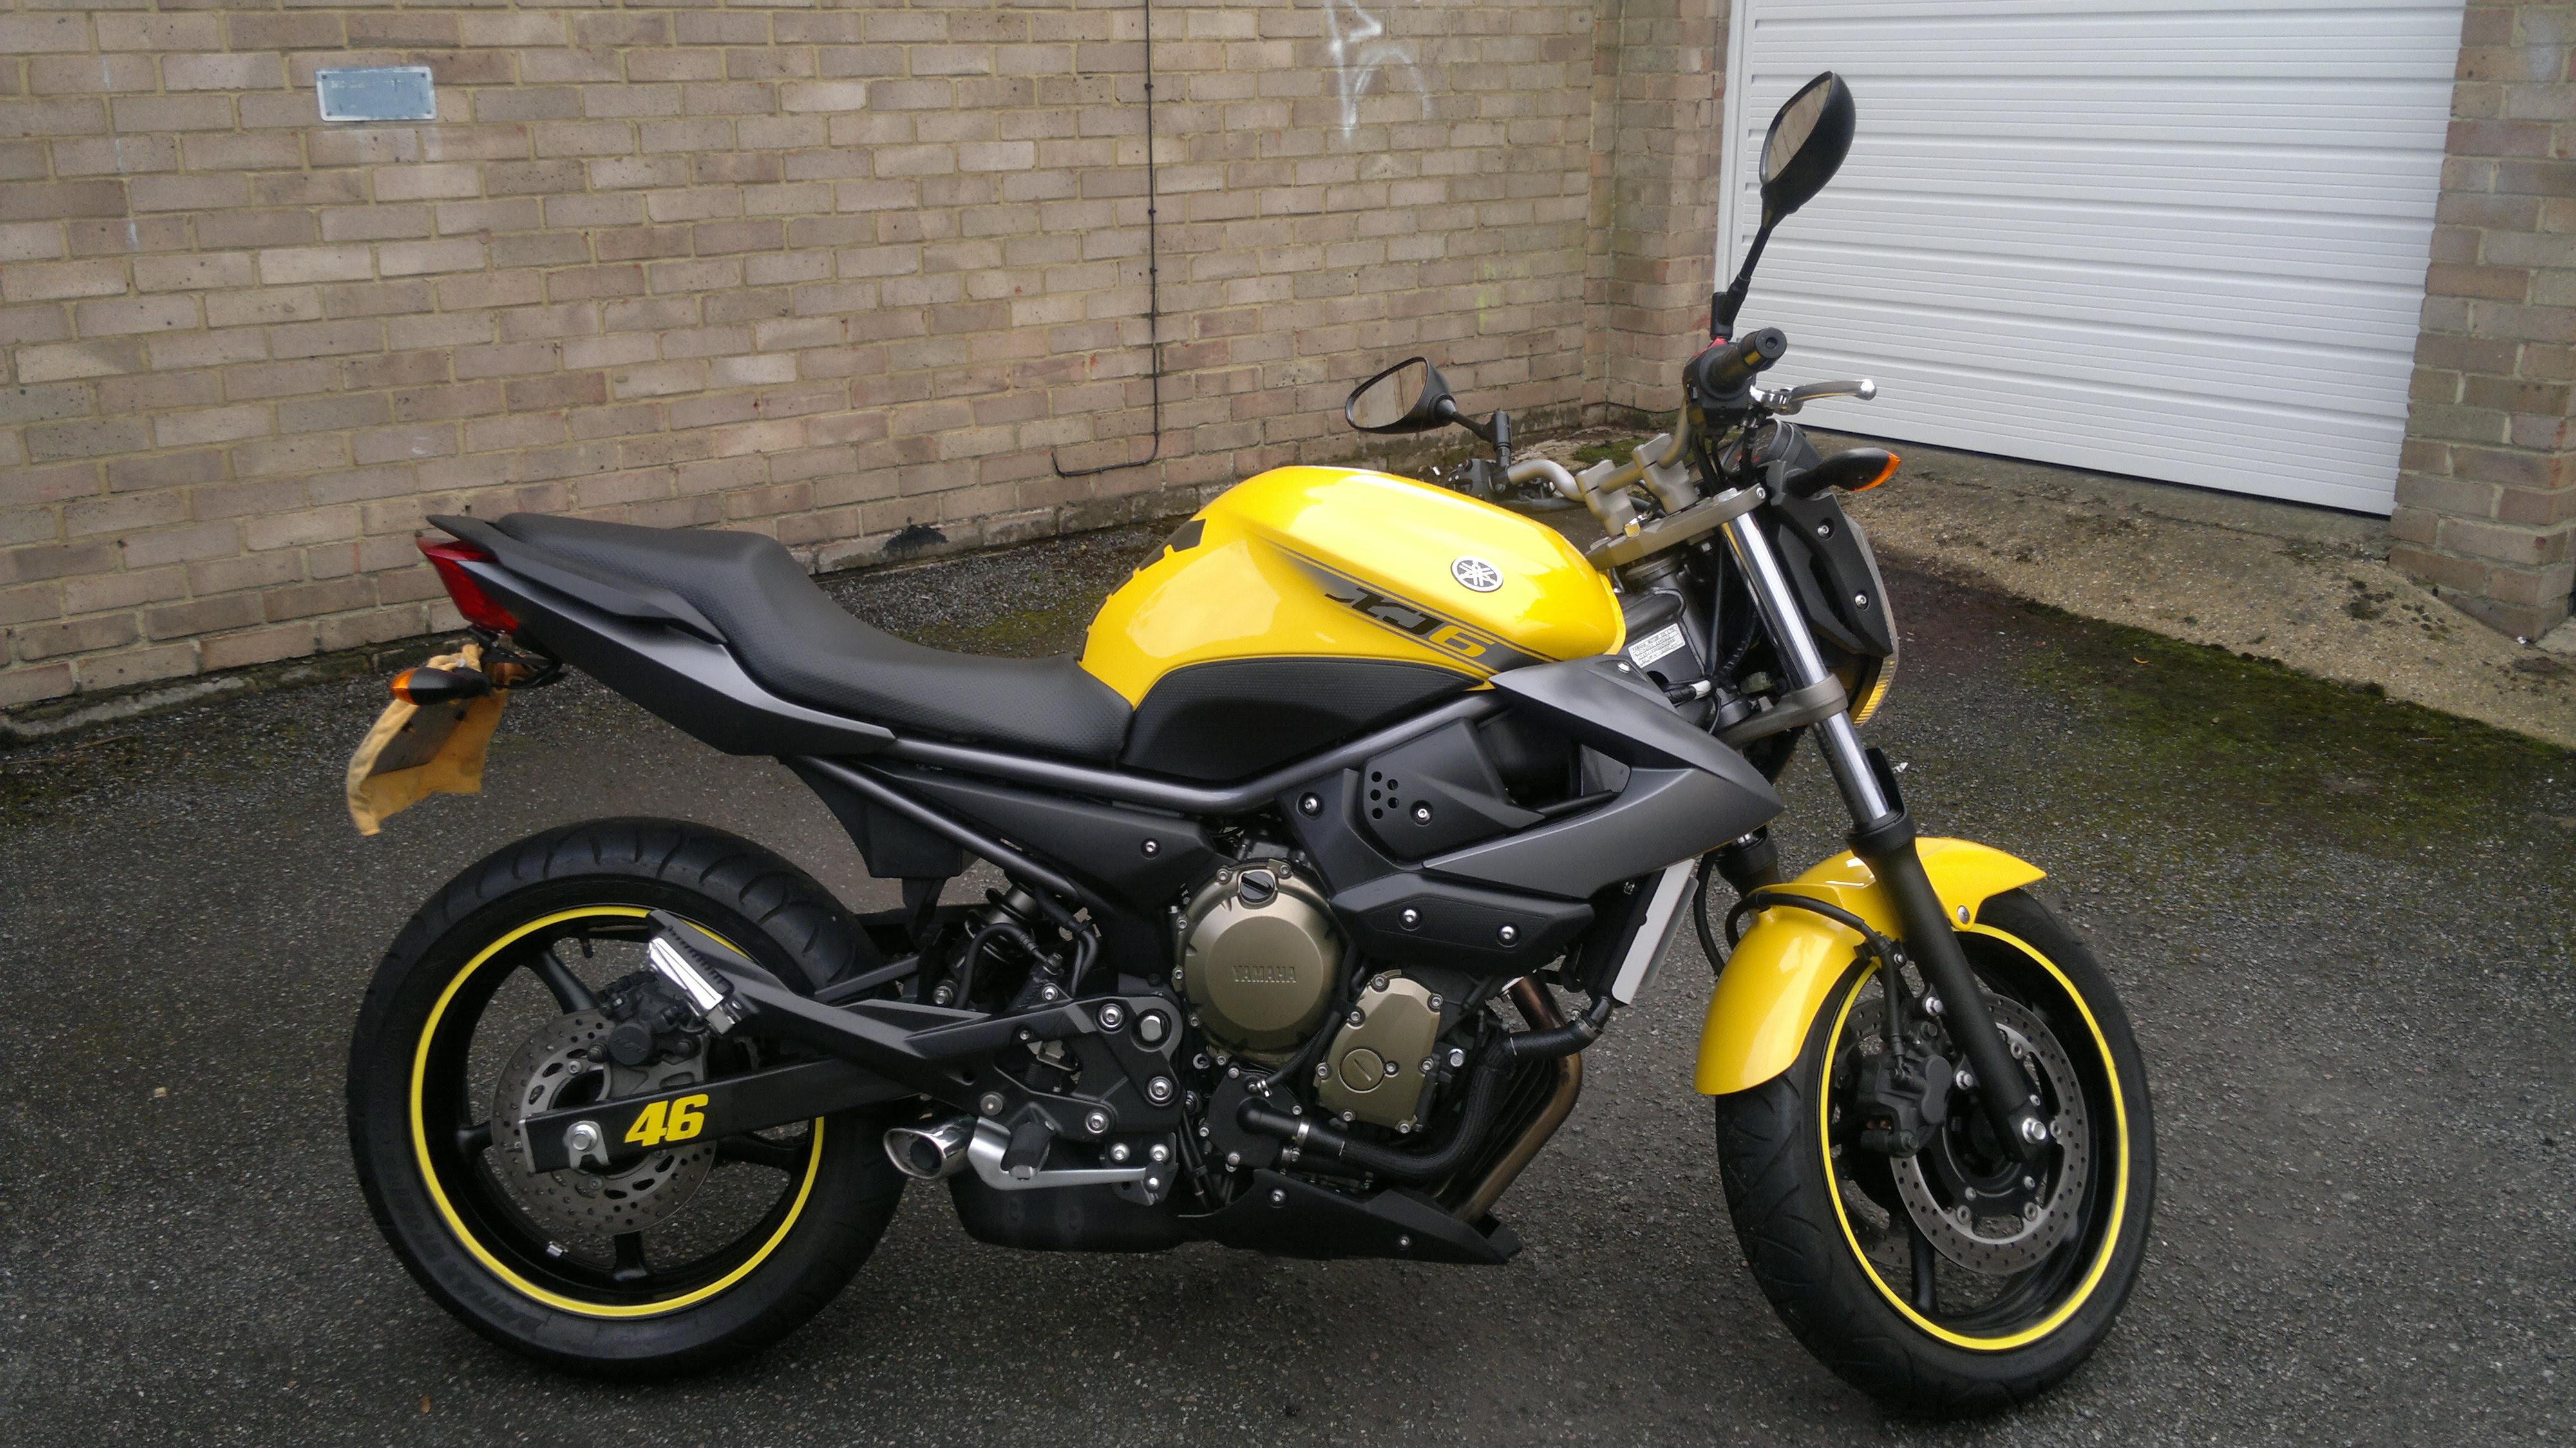 Yamaha Moto Xj6 - Brick7 Motos